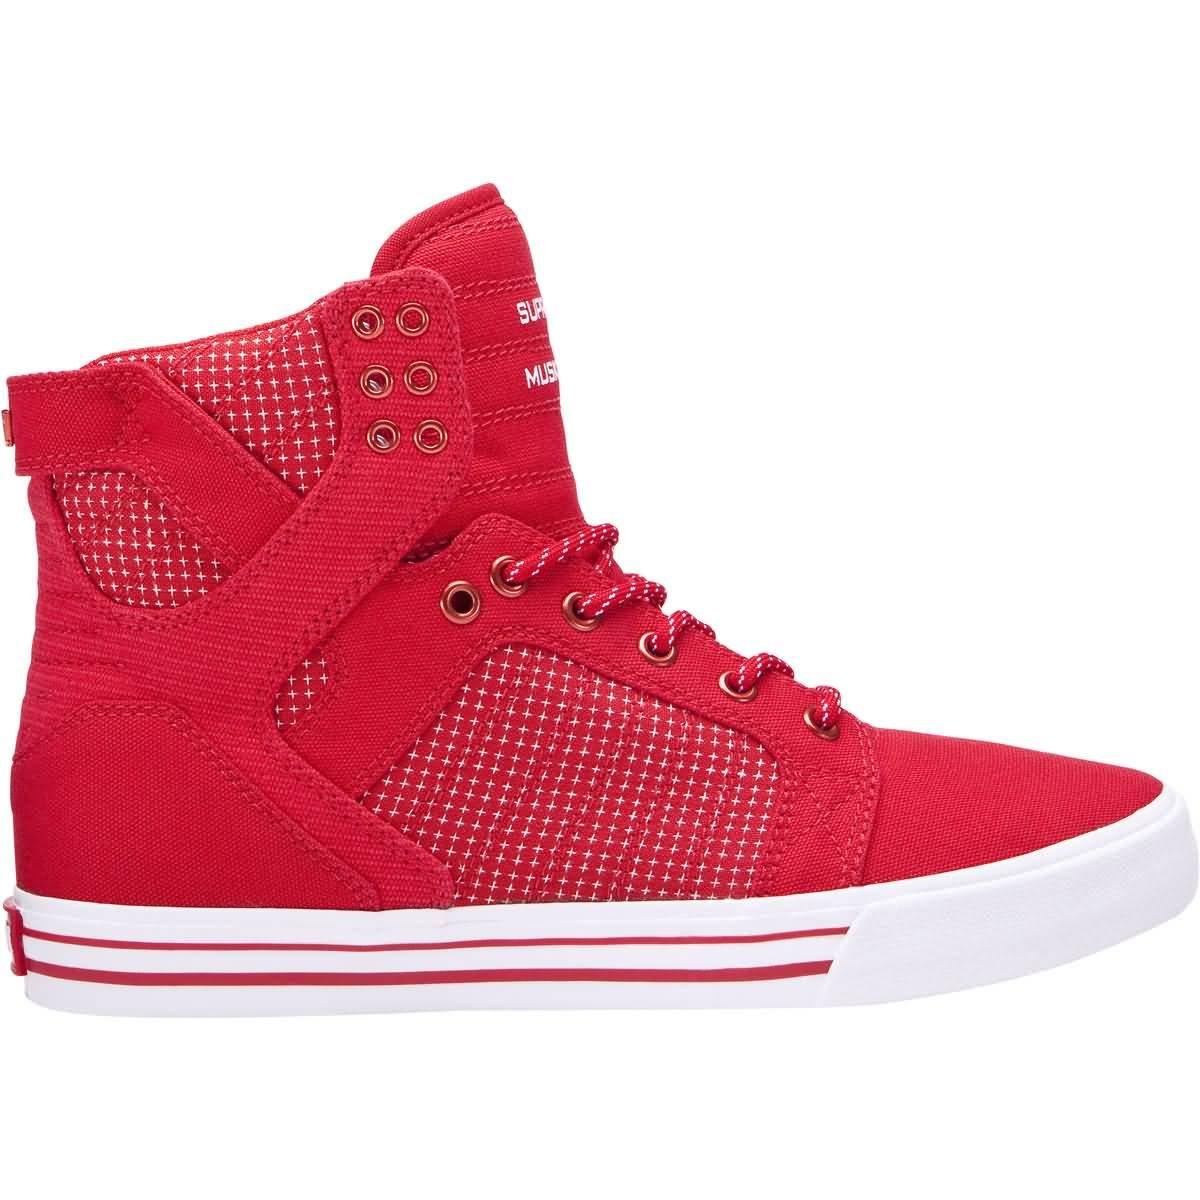 64f40c74cec8 Galleon - Supra Men s Skytop  18 Shoes